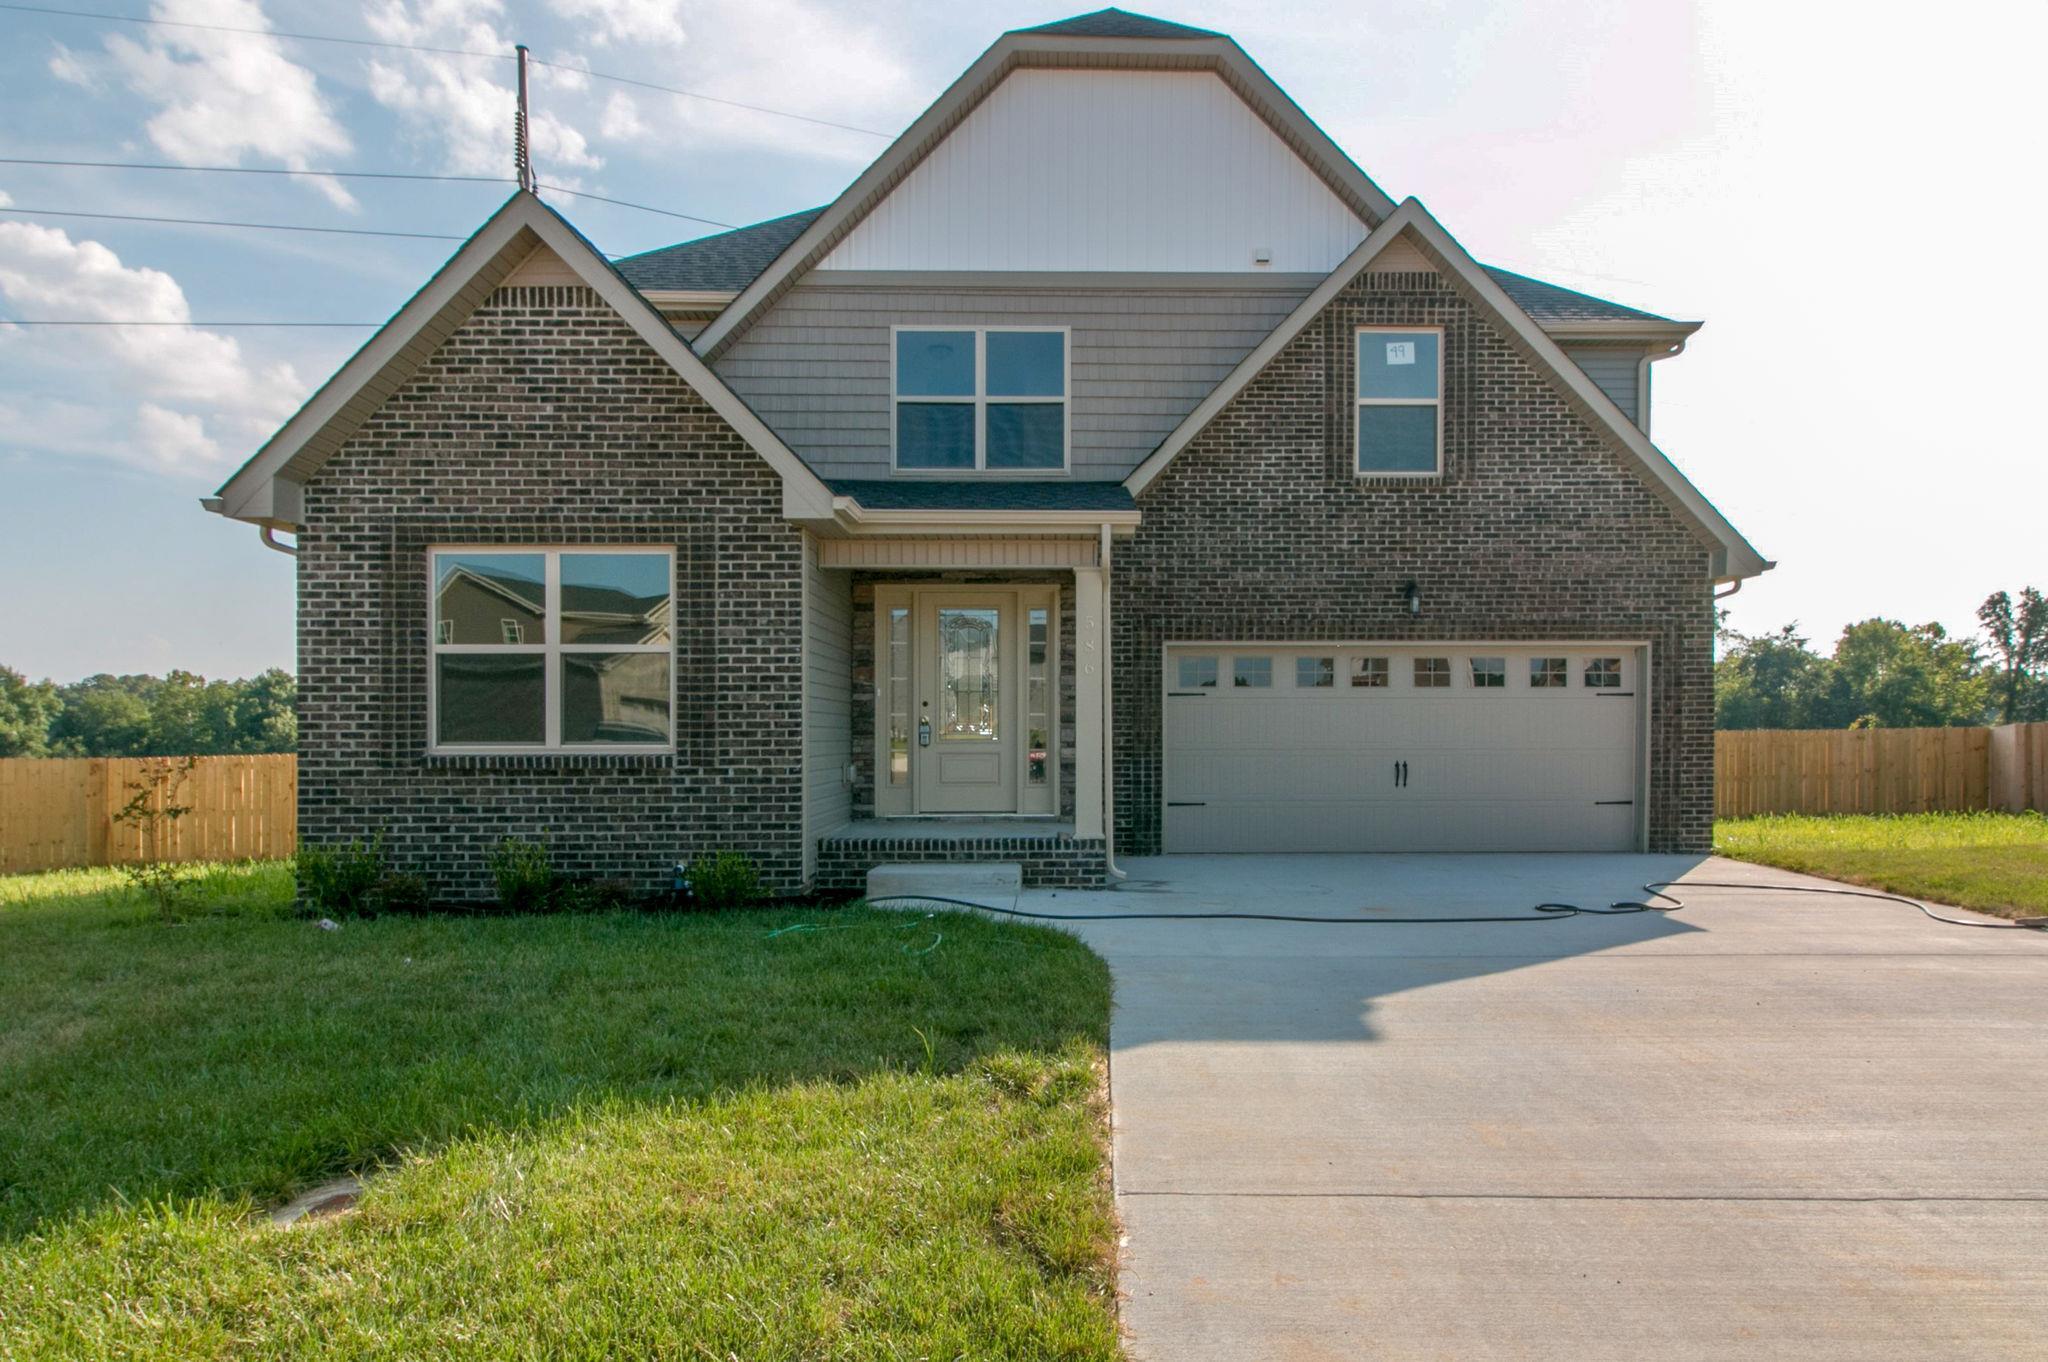 586 Silver Oak Court, Lot49, Clarksville, TN 37042 - Clarksville, TN real estate listing